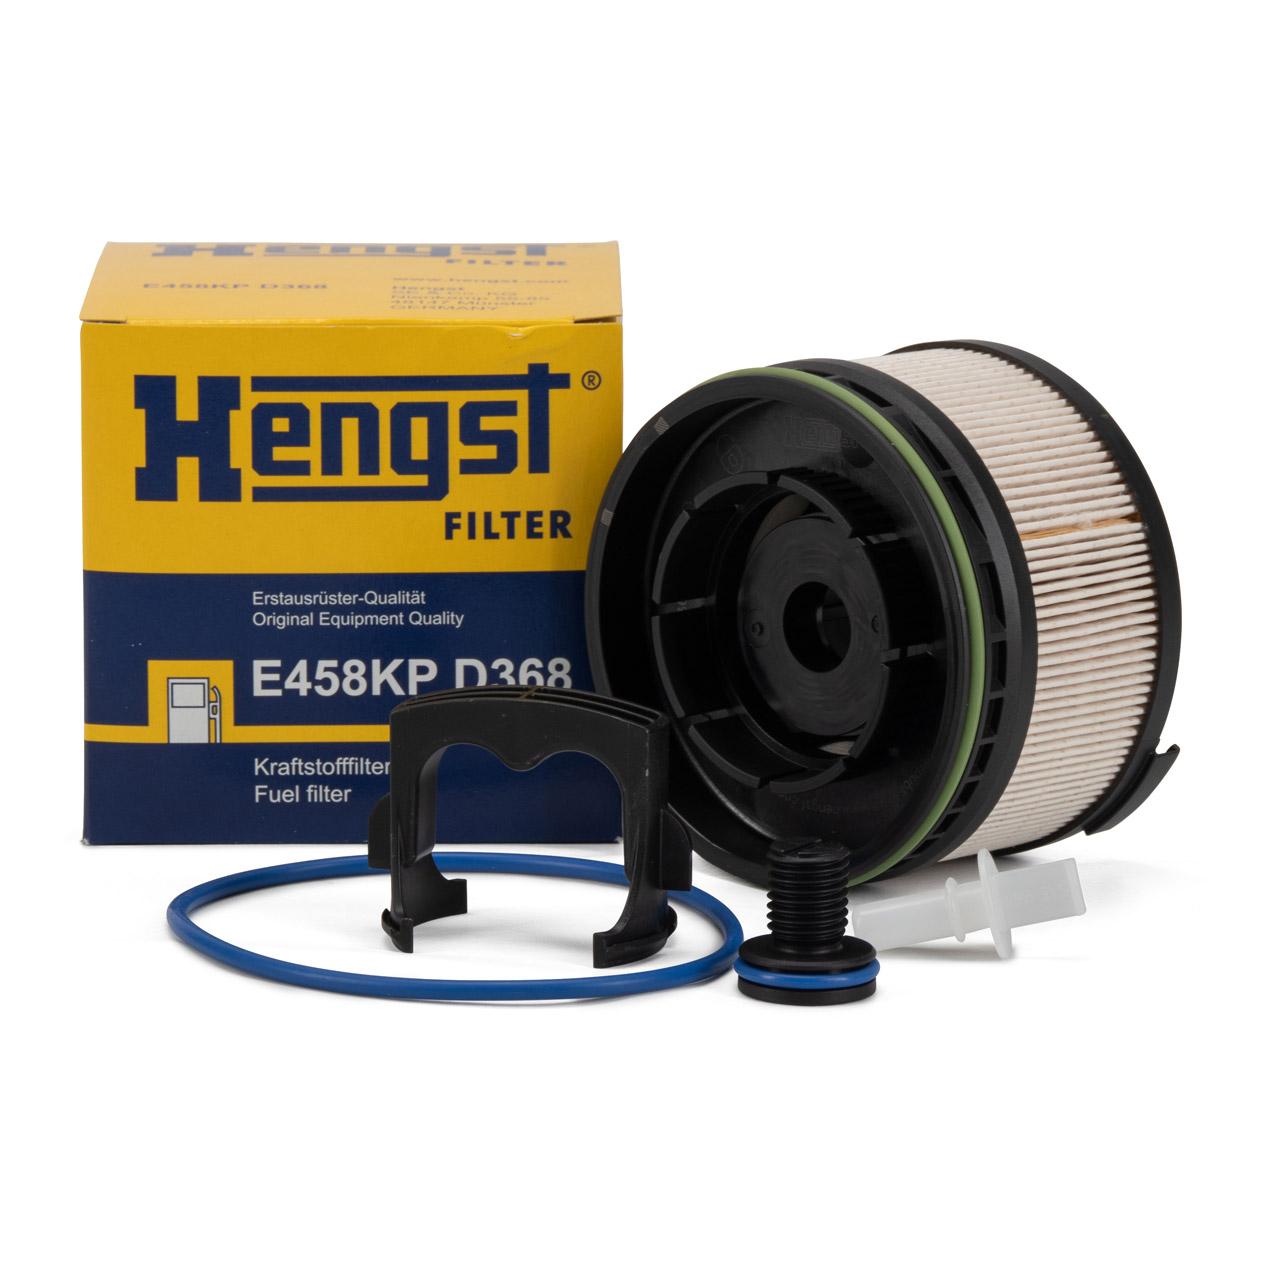 HENGST E458KPD368 Kraftstofffilter für MERCEDES 160-300d OM608 OM651 OM654